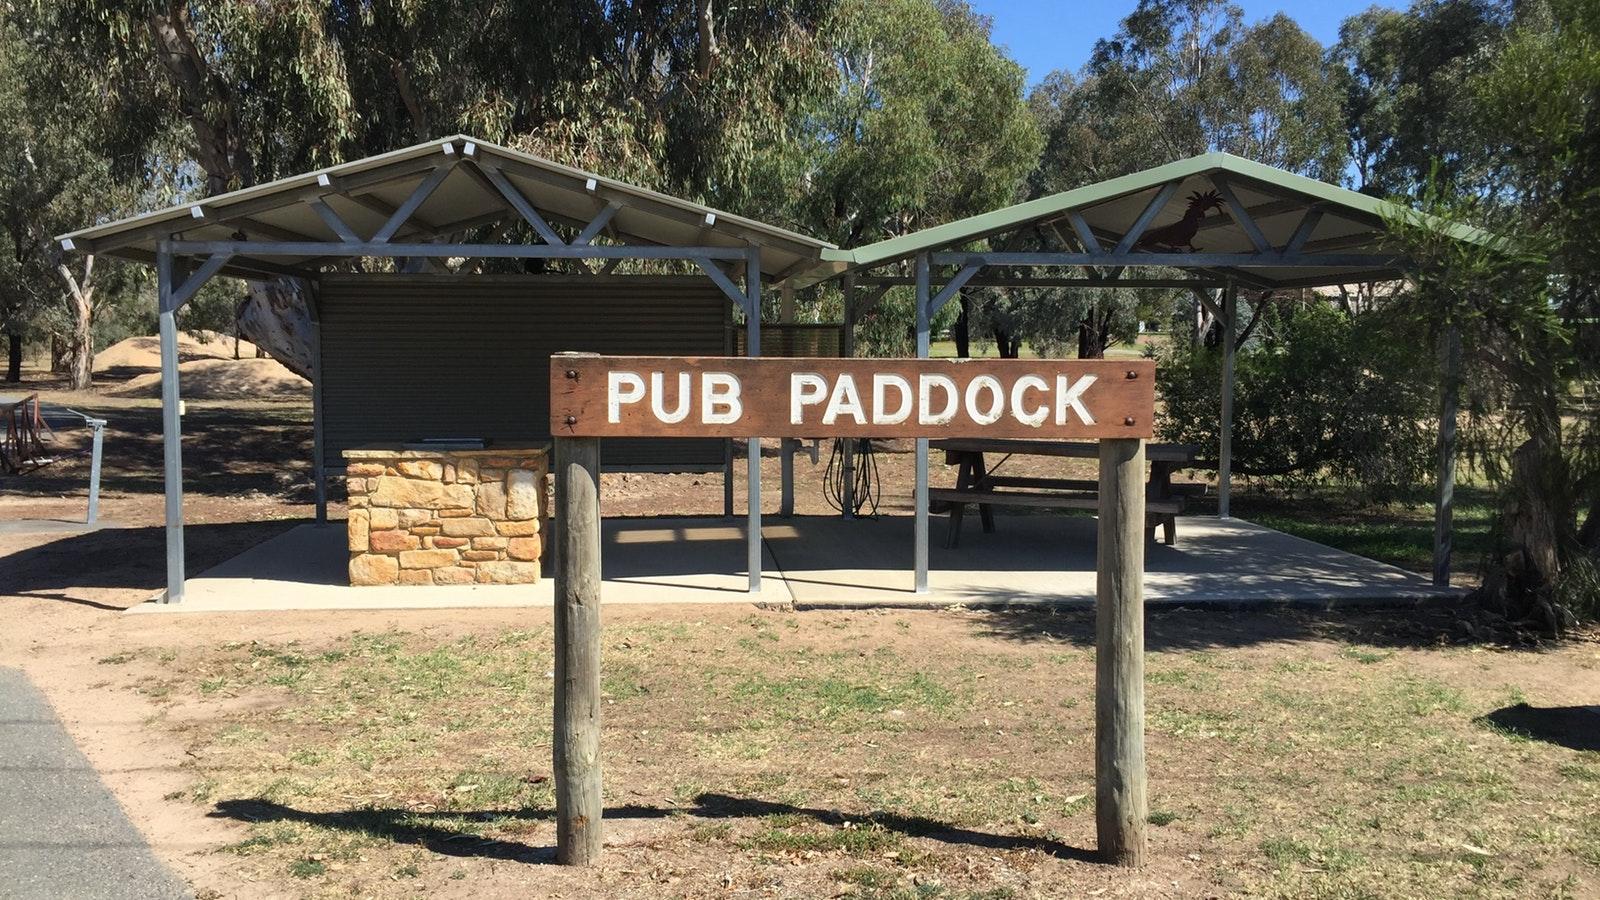 The Pub Paddock